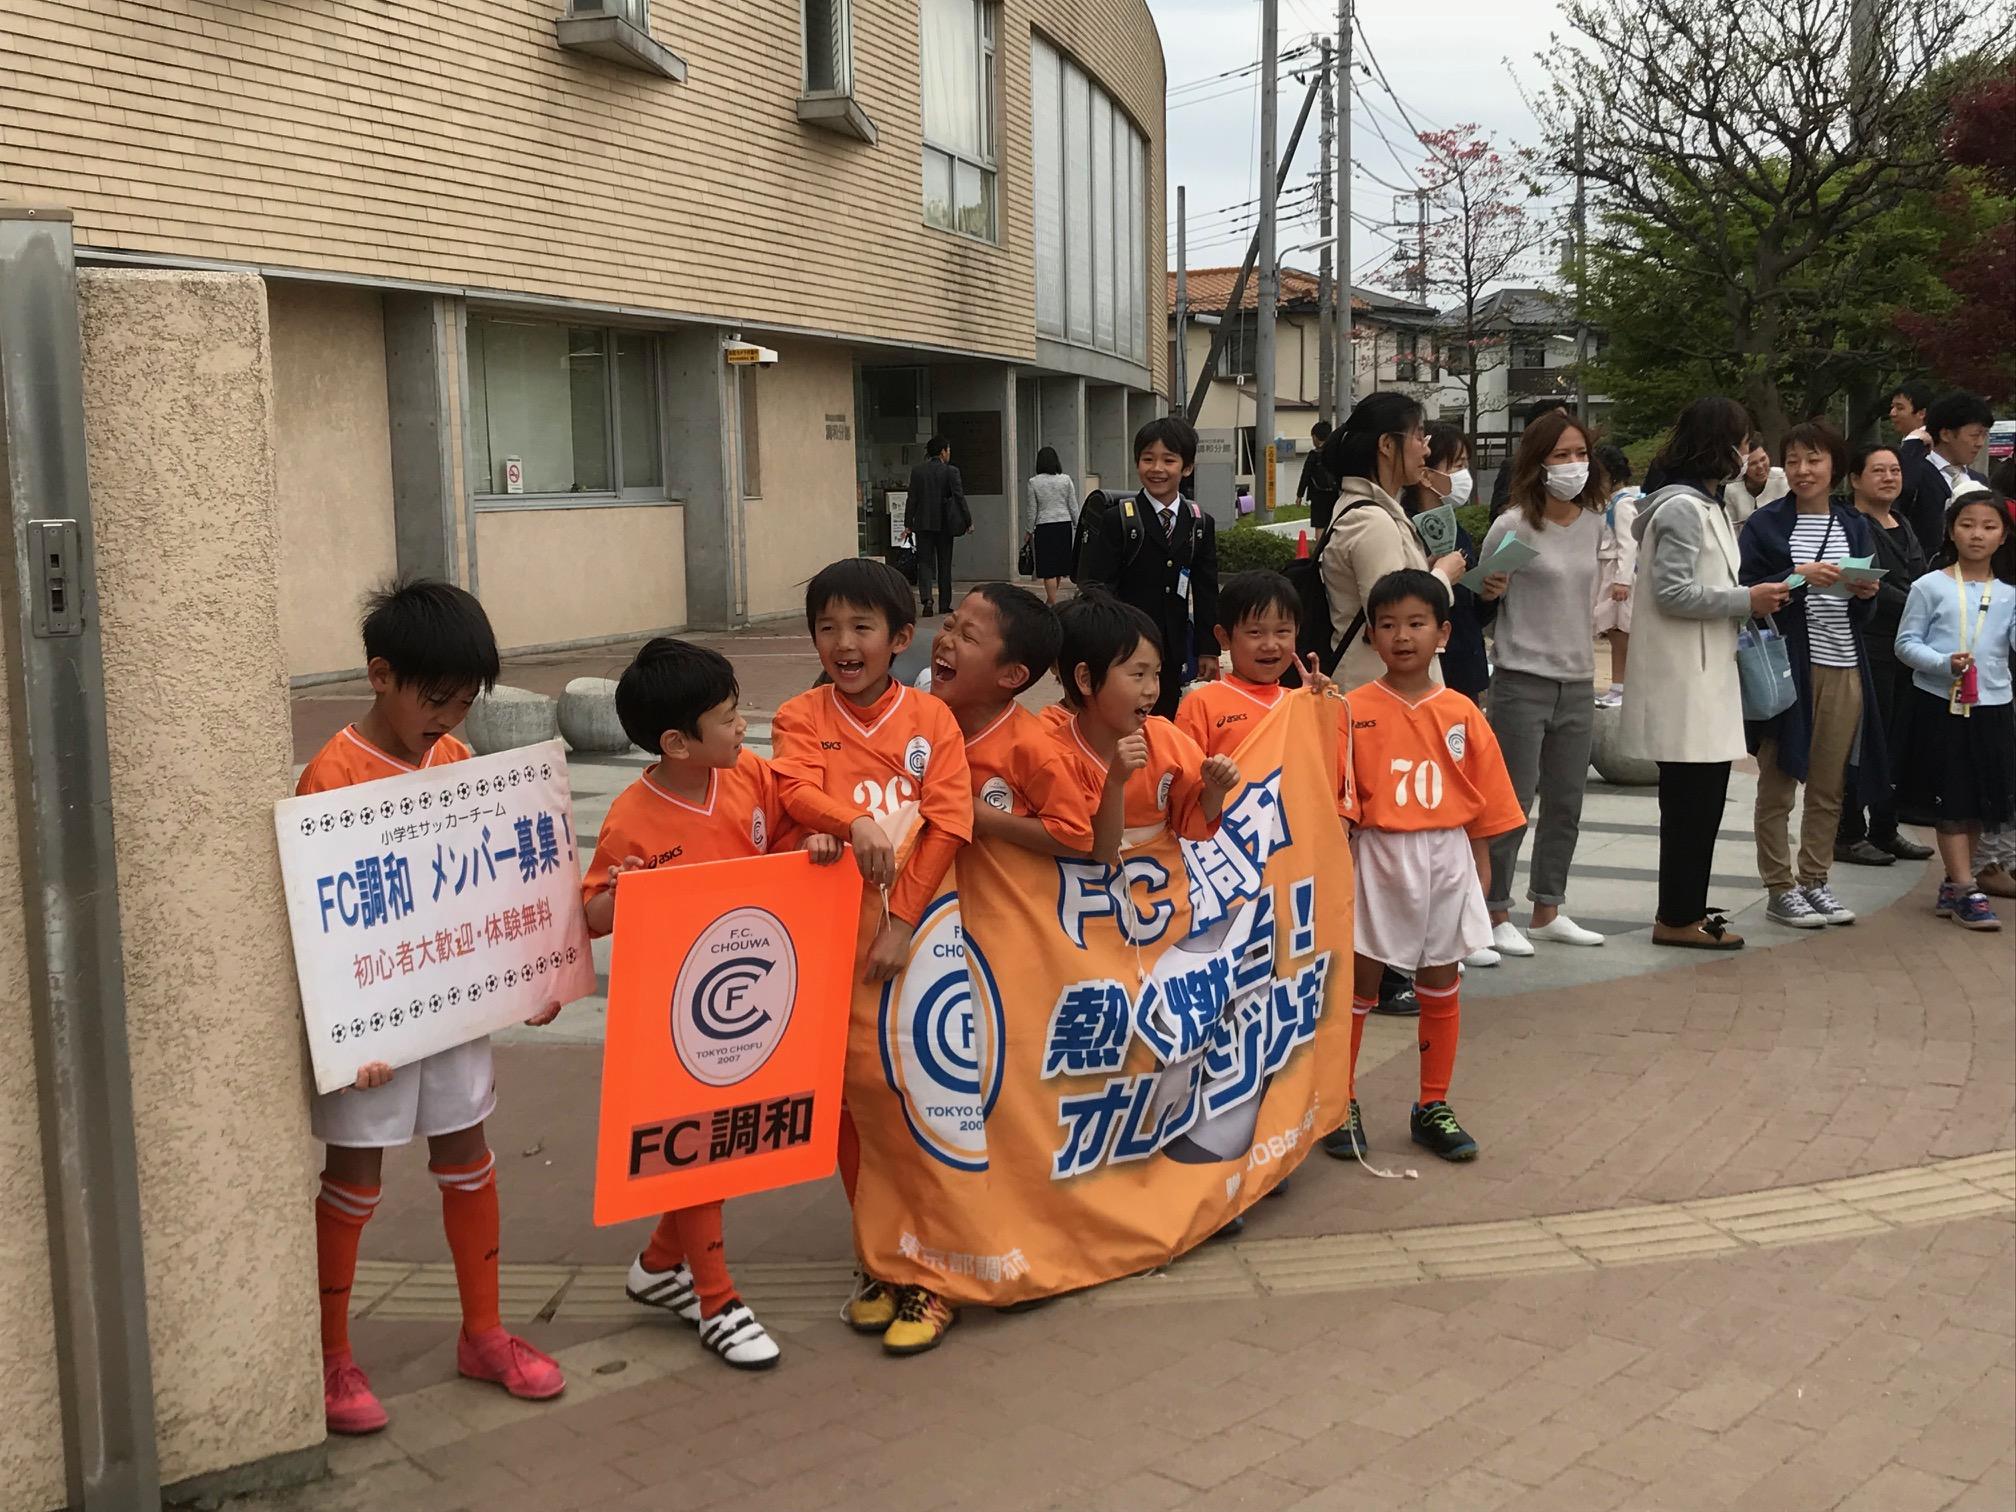 http://www.fc-chouwa.net/blog/images/IMG_0635.jpg